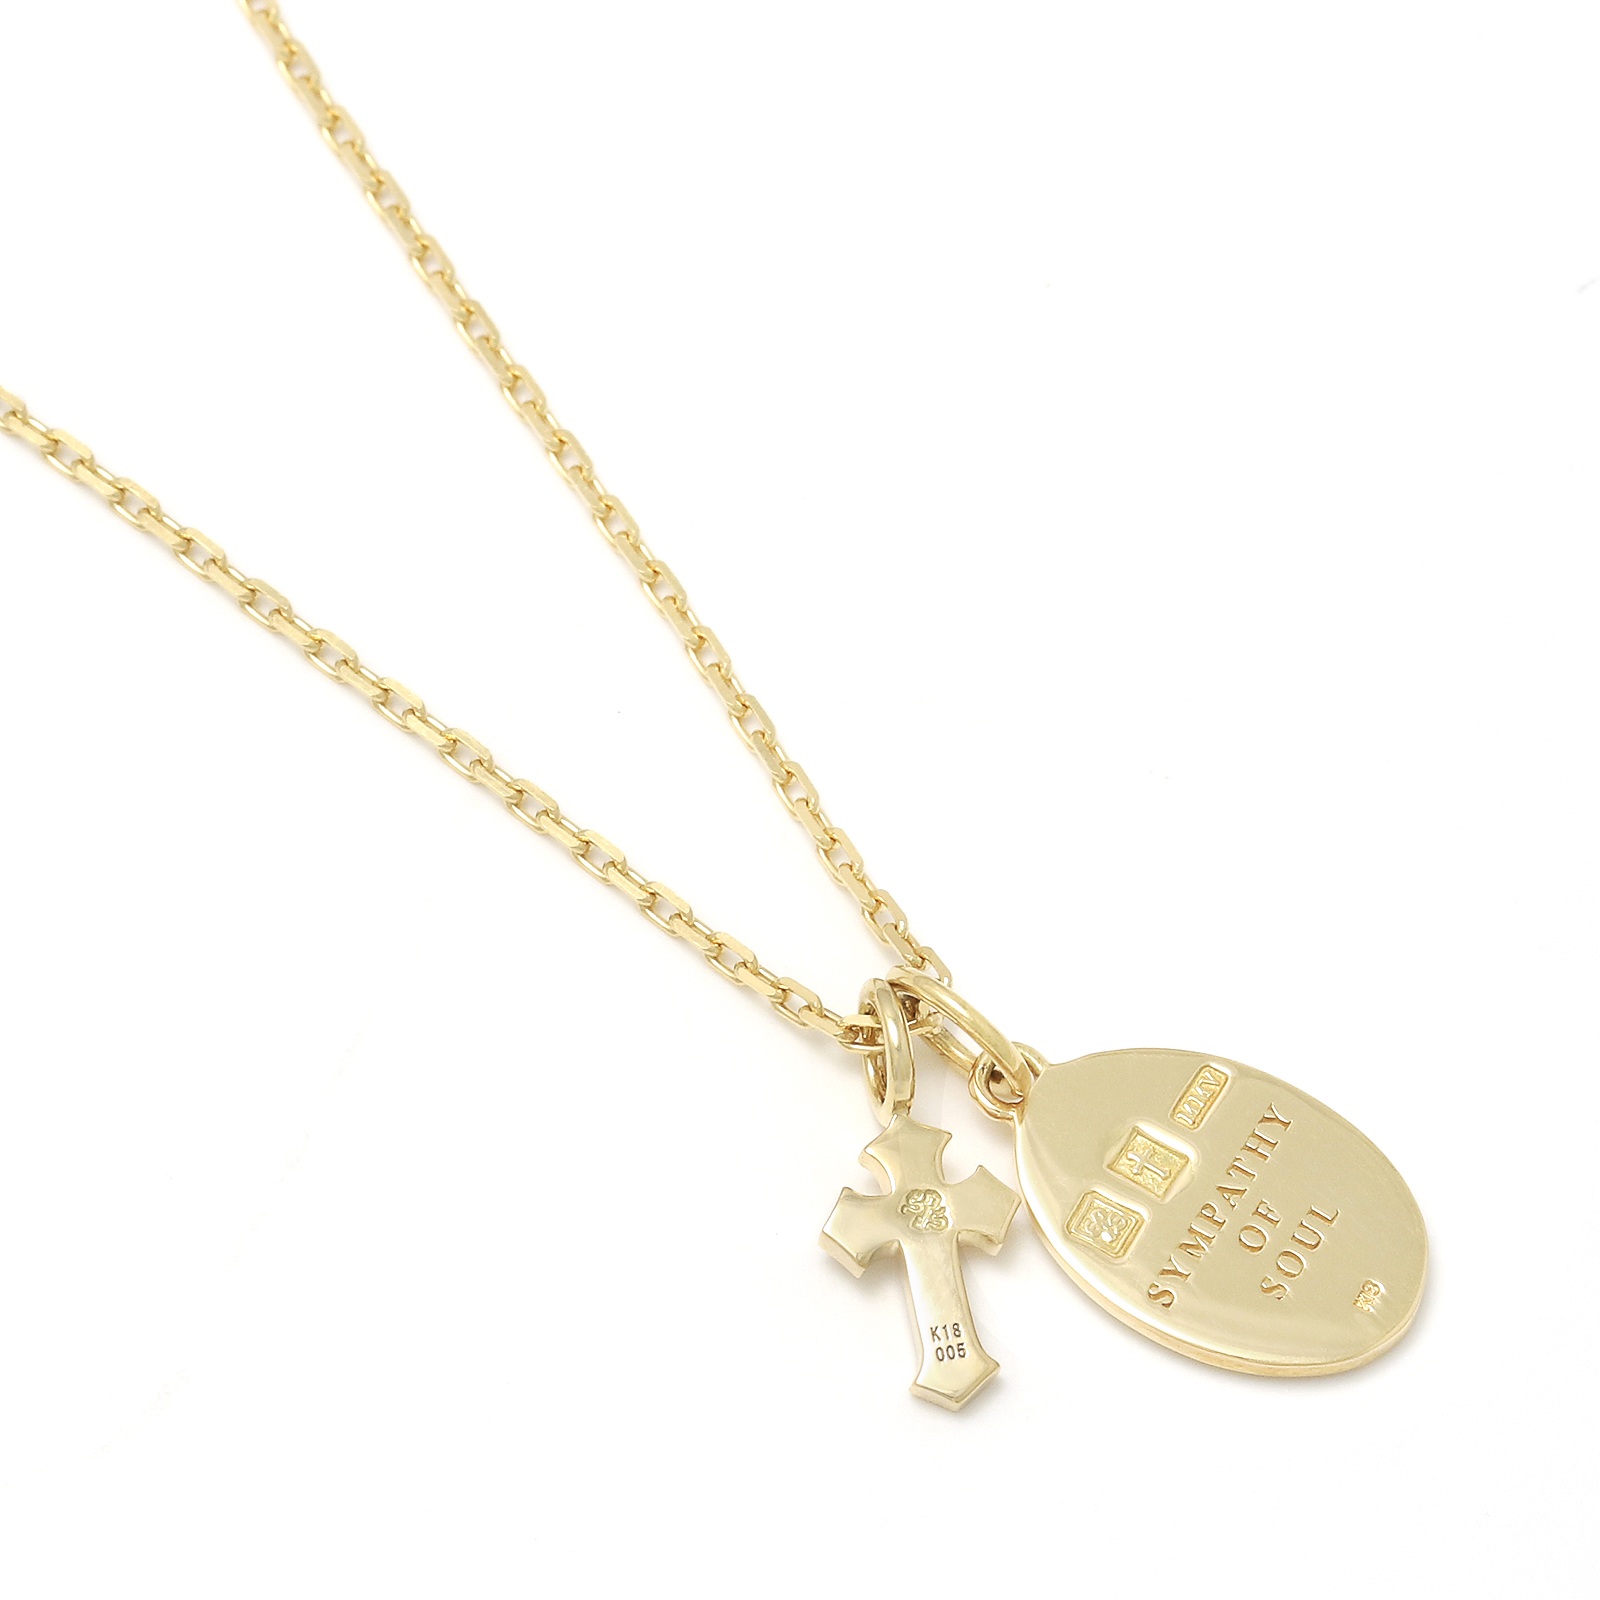 Maria Pendant + Little Cross Charm - K18Yellow Gold w/Diamond Set Necklace